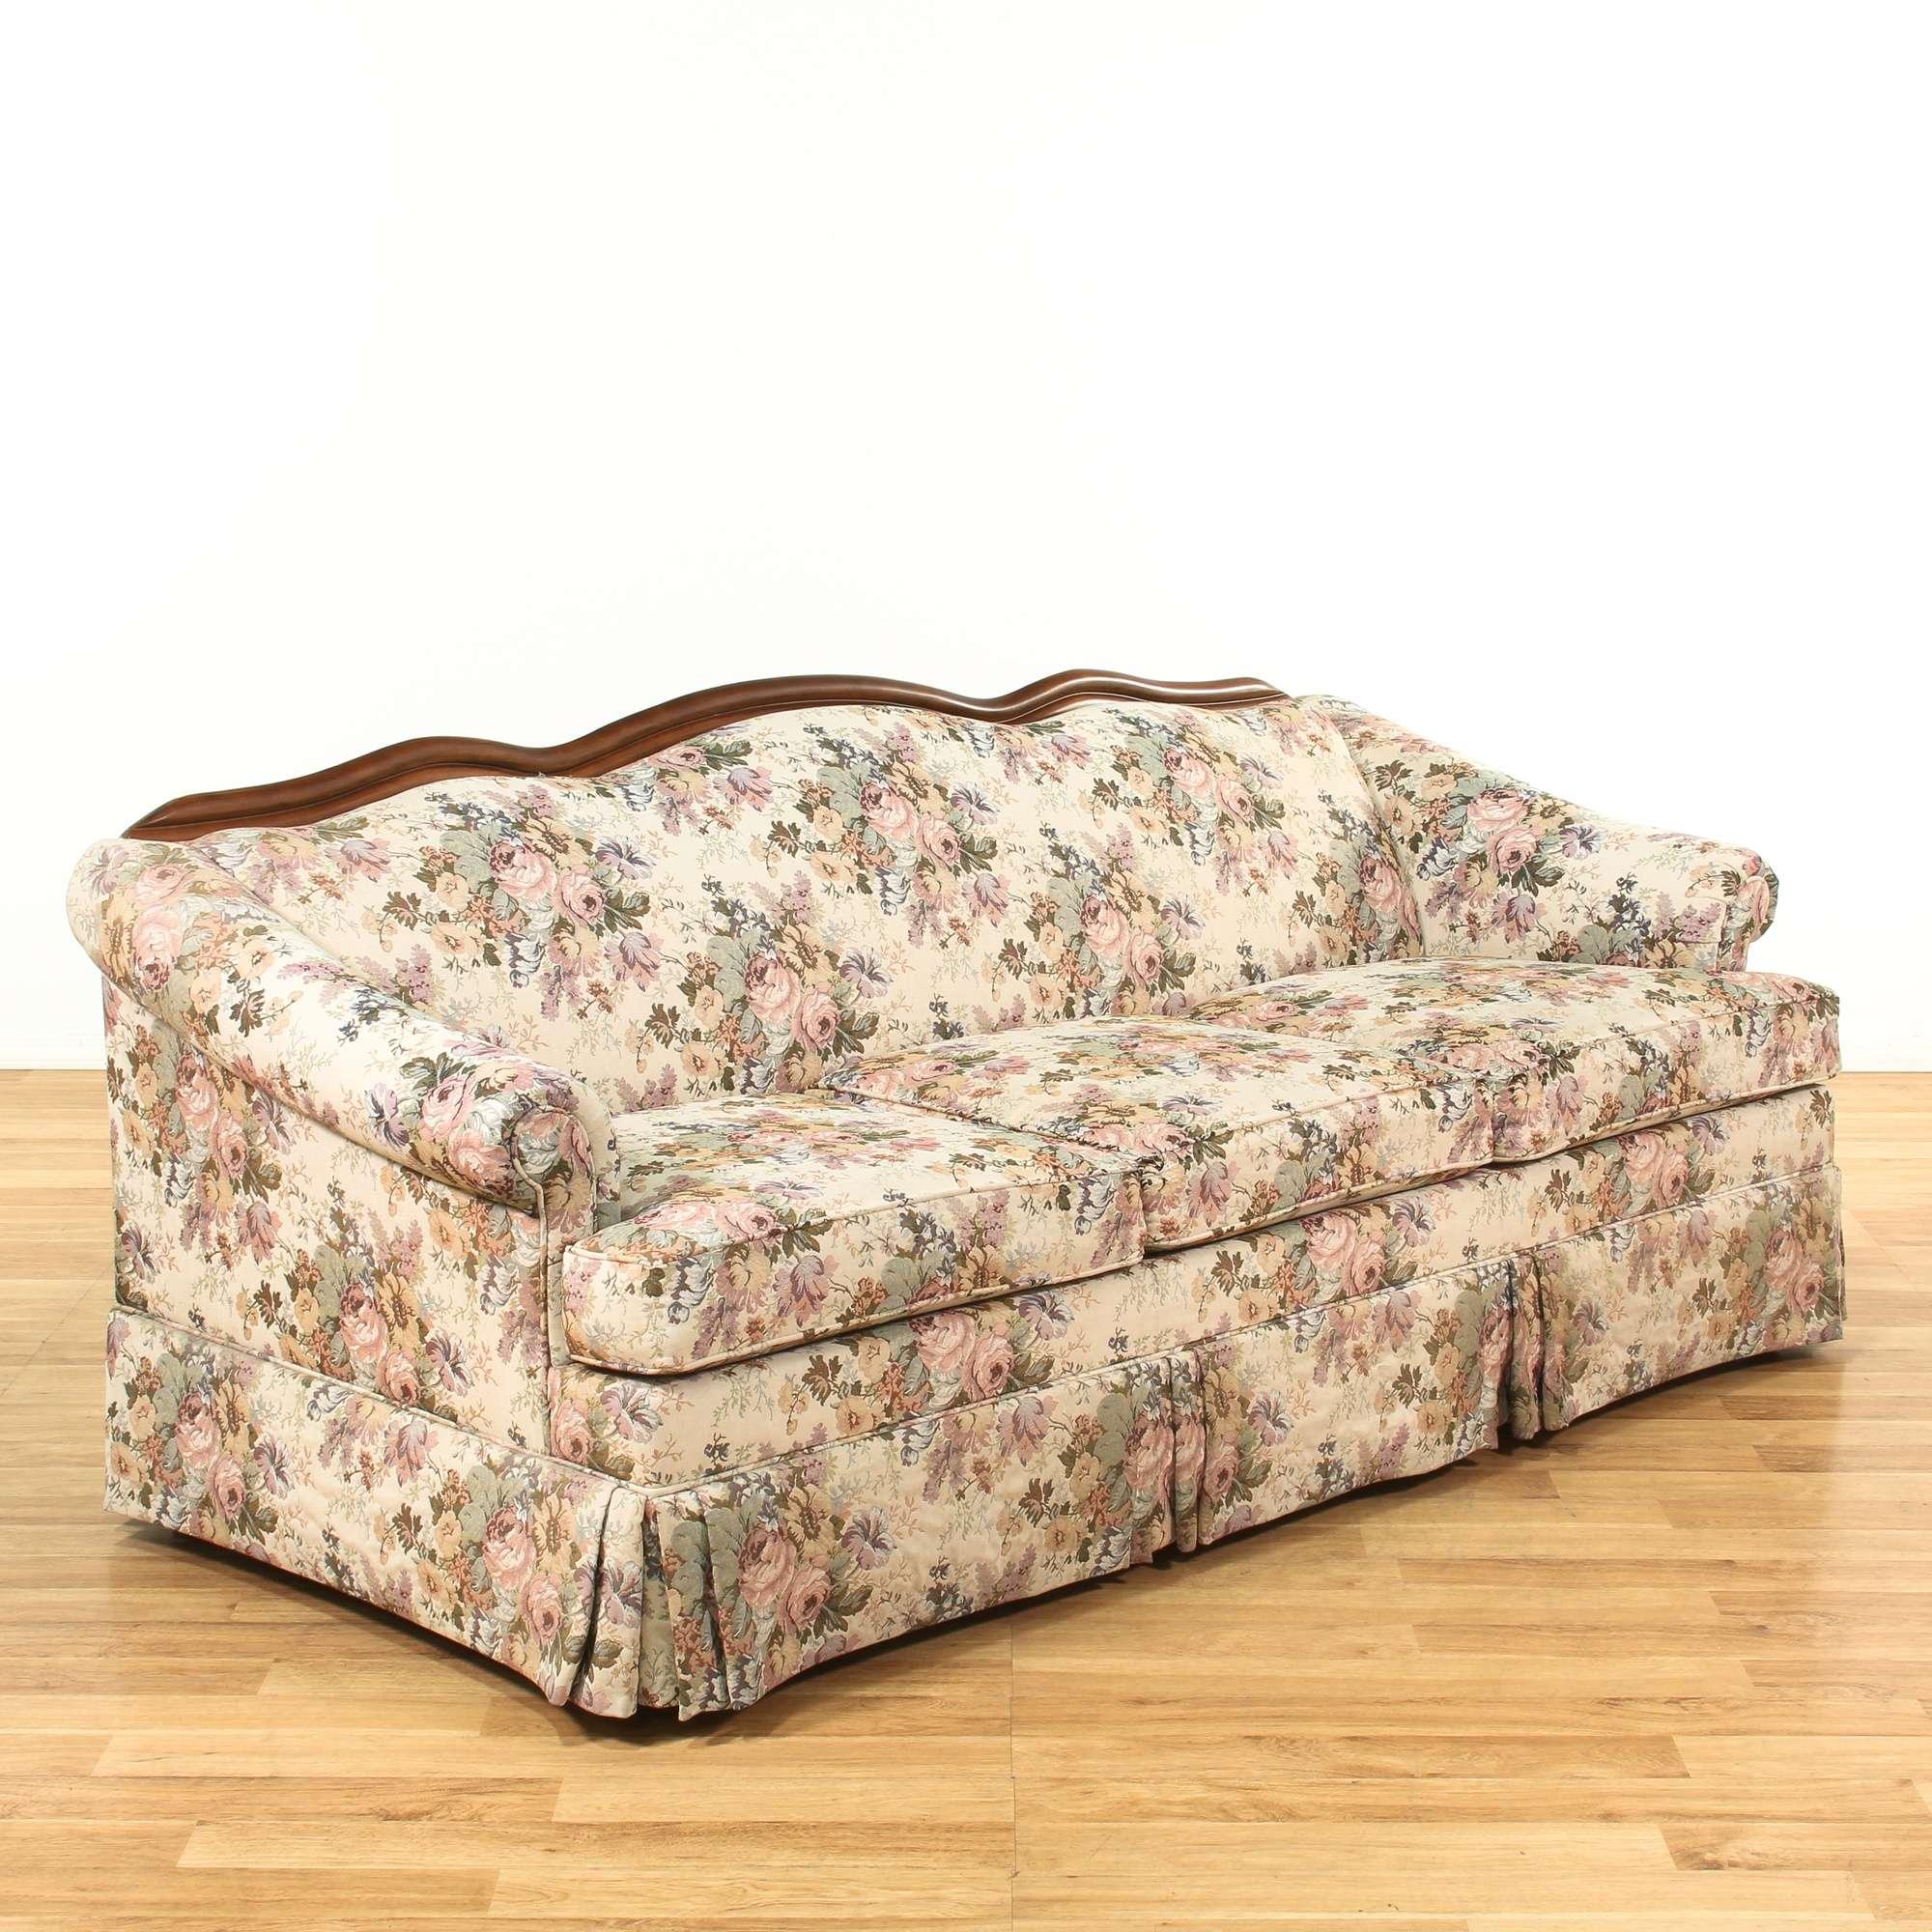 Ethan Allen Sleeper Sofa W Wood Trim Loveseat Vintage